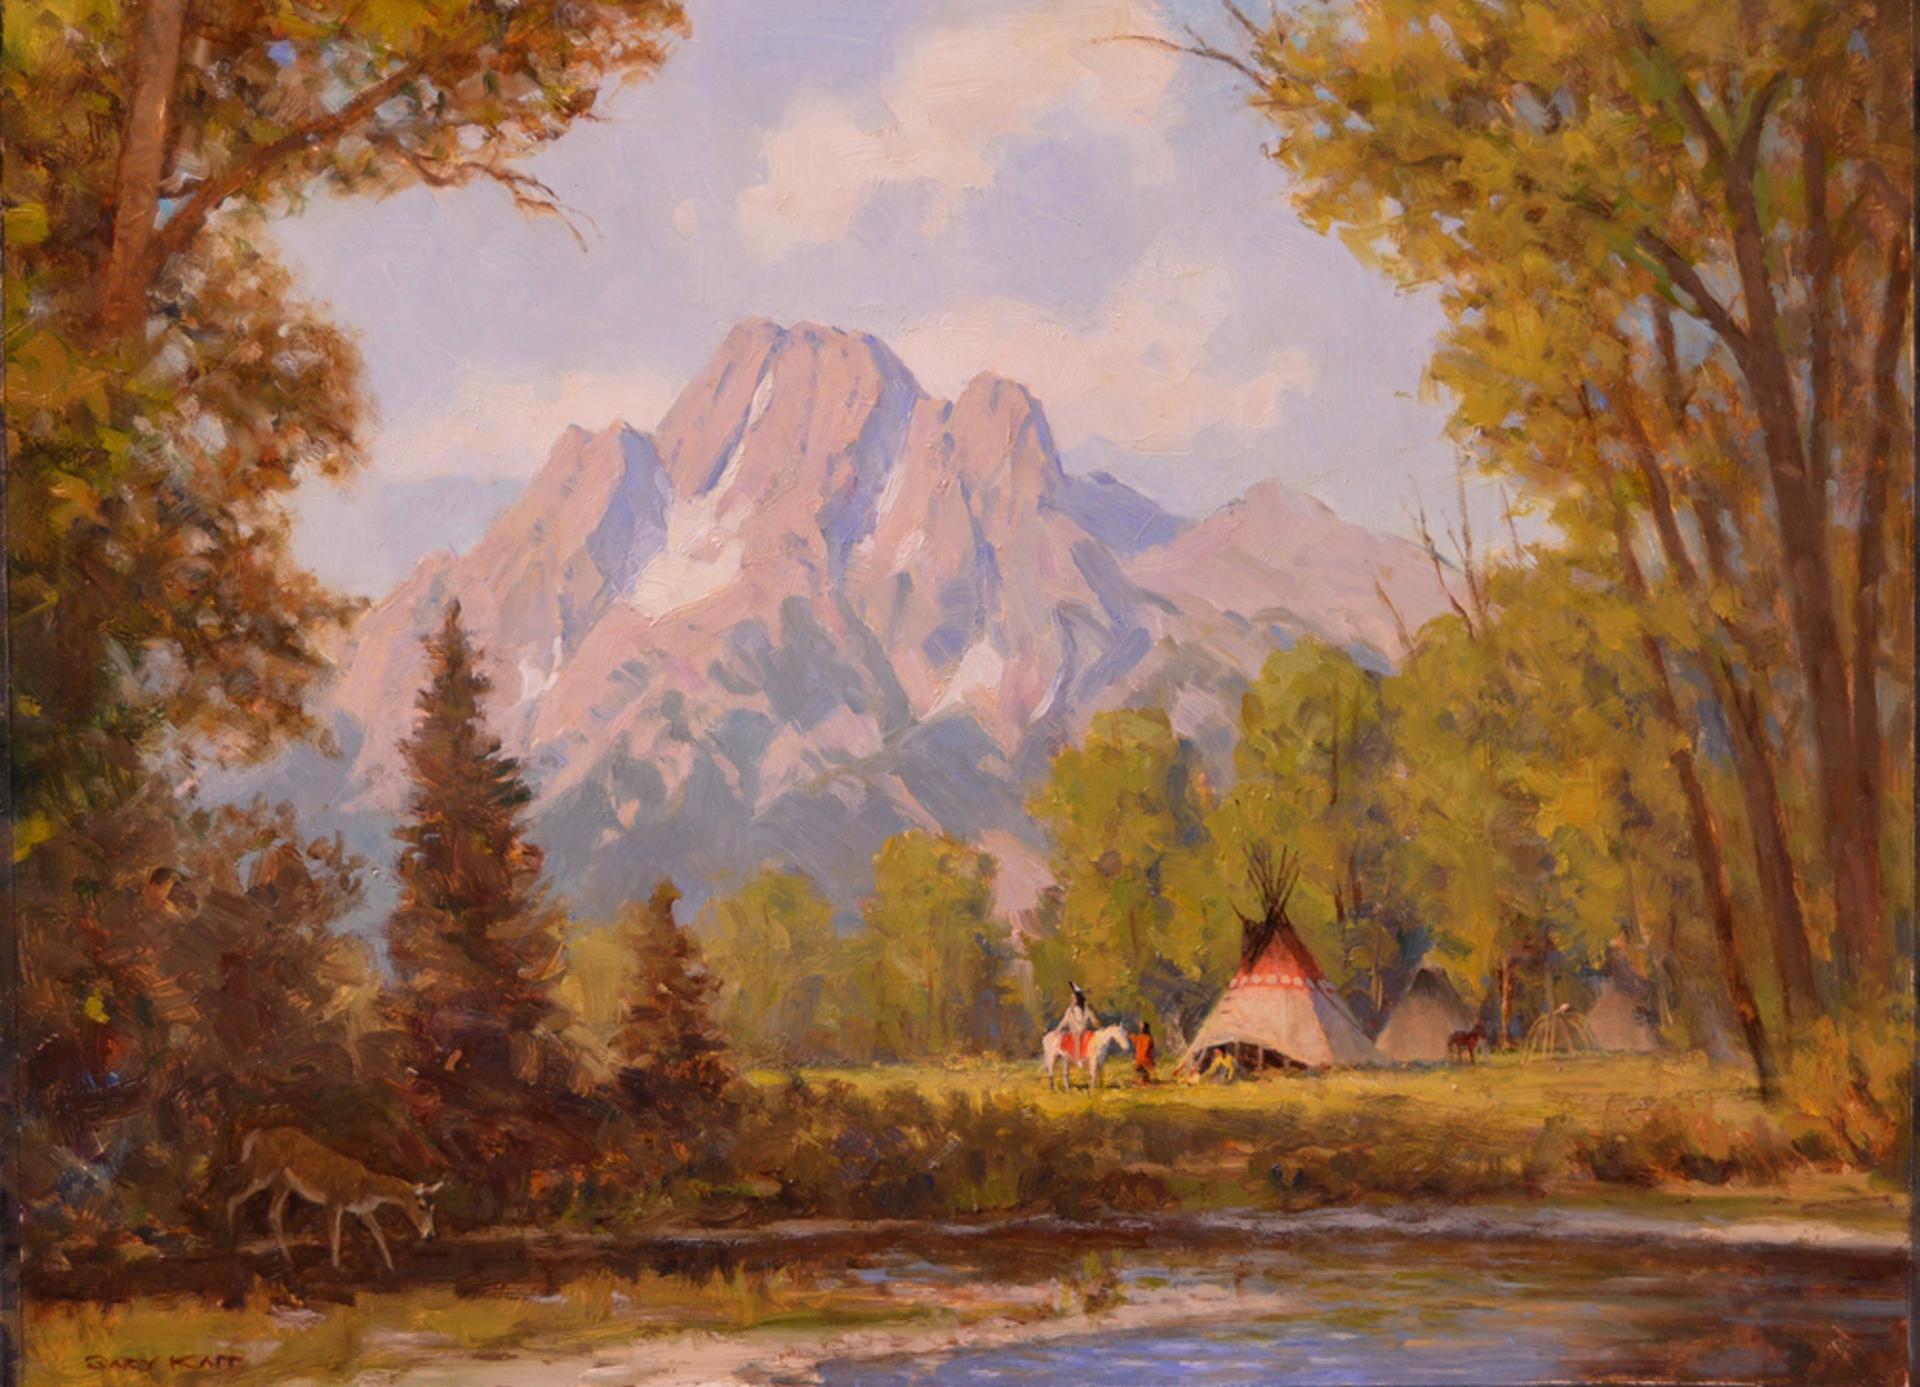 Piegan Summer Camp by Gary Kapp